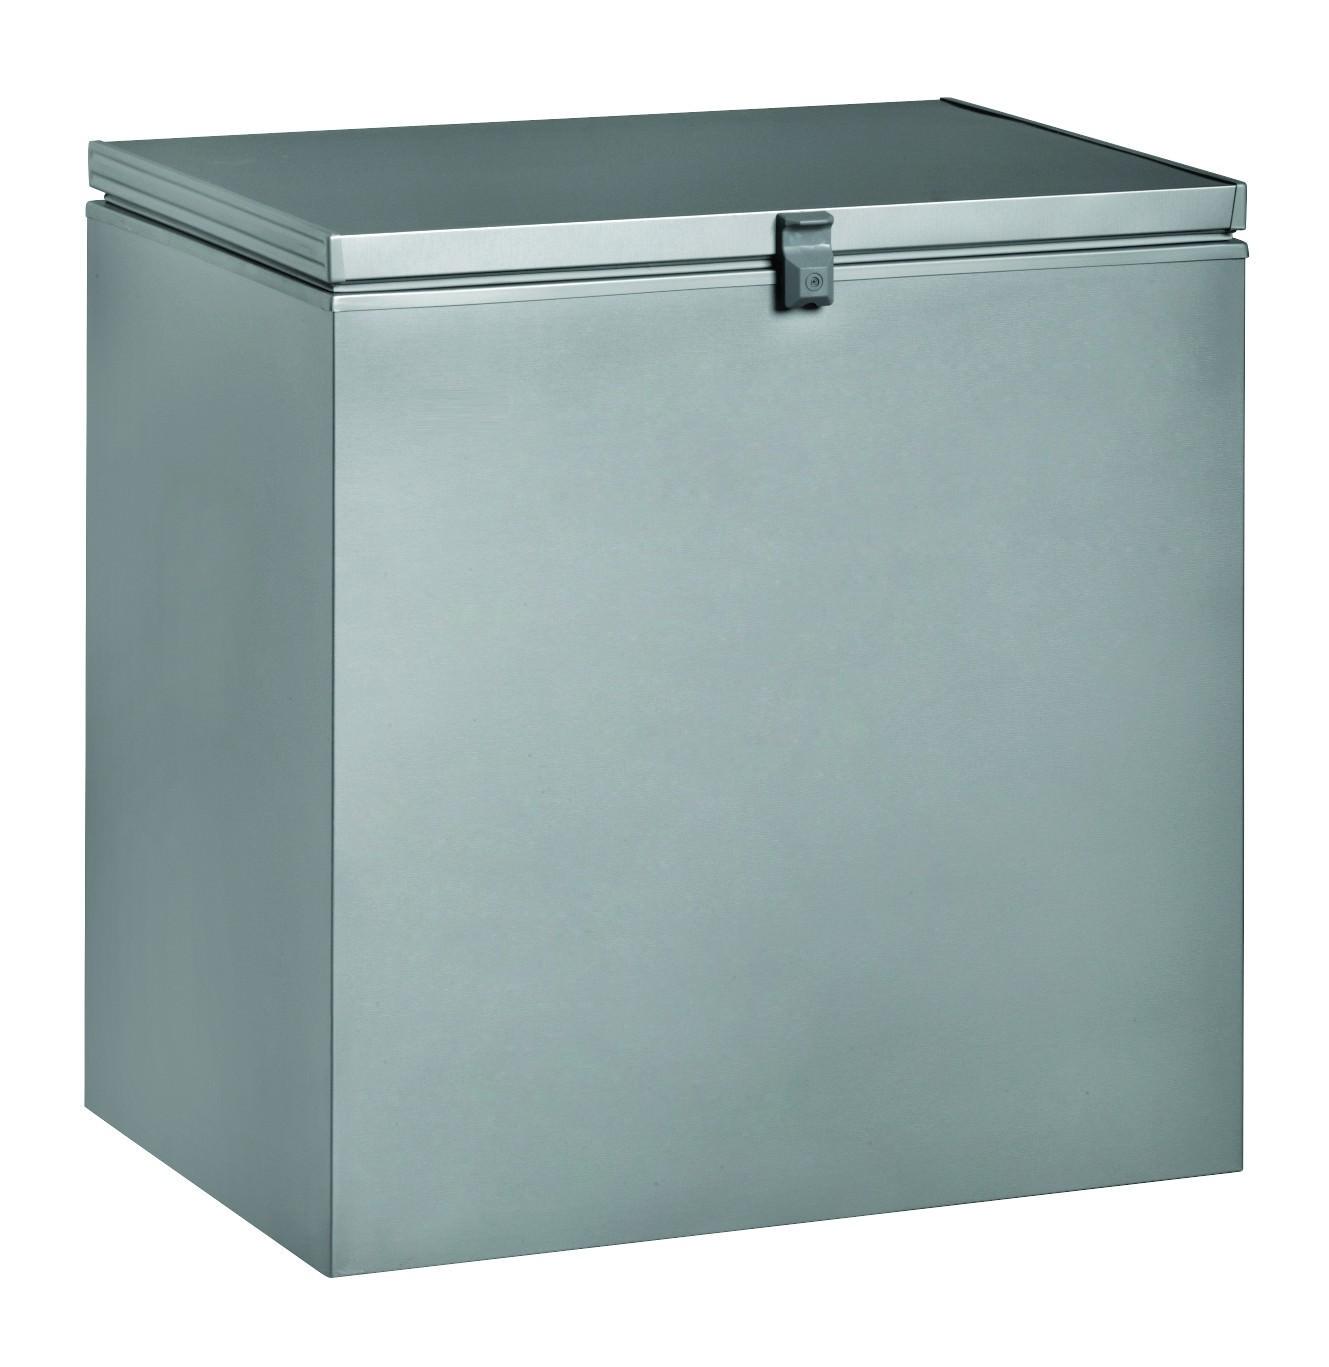 Rhino GF180IP Gas/Electric/Paraffin Single Lid Beverage Cooler